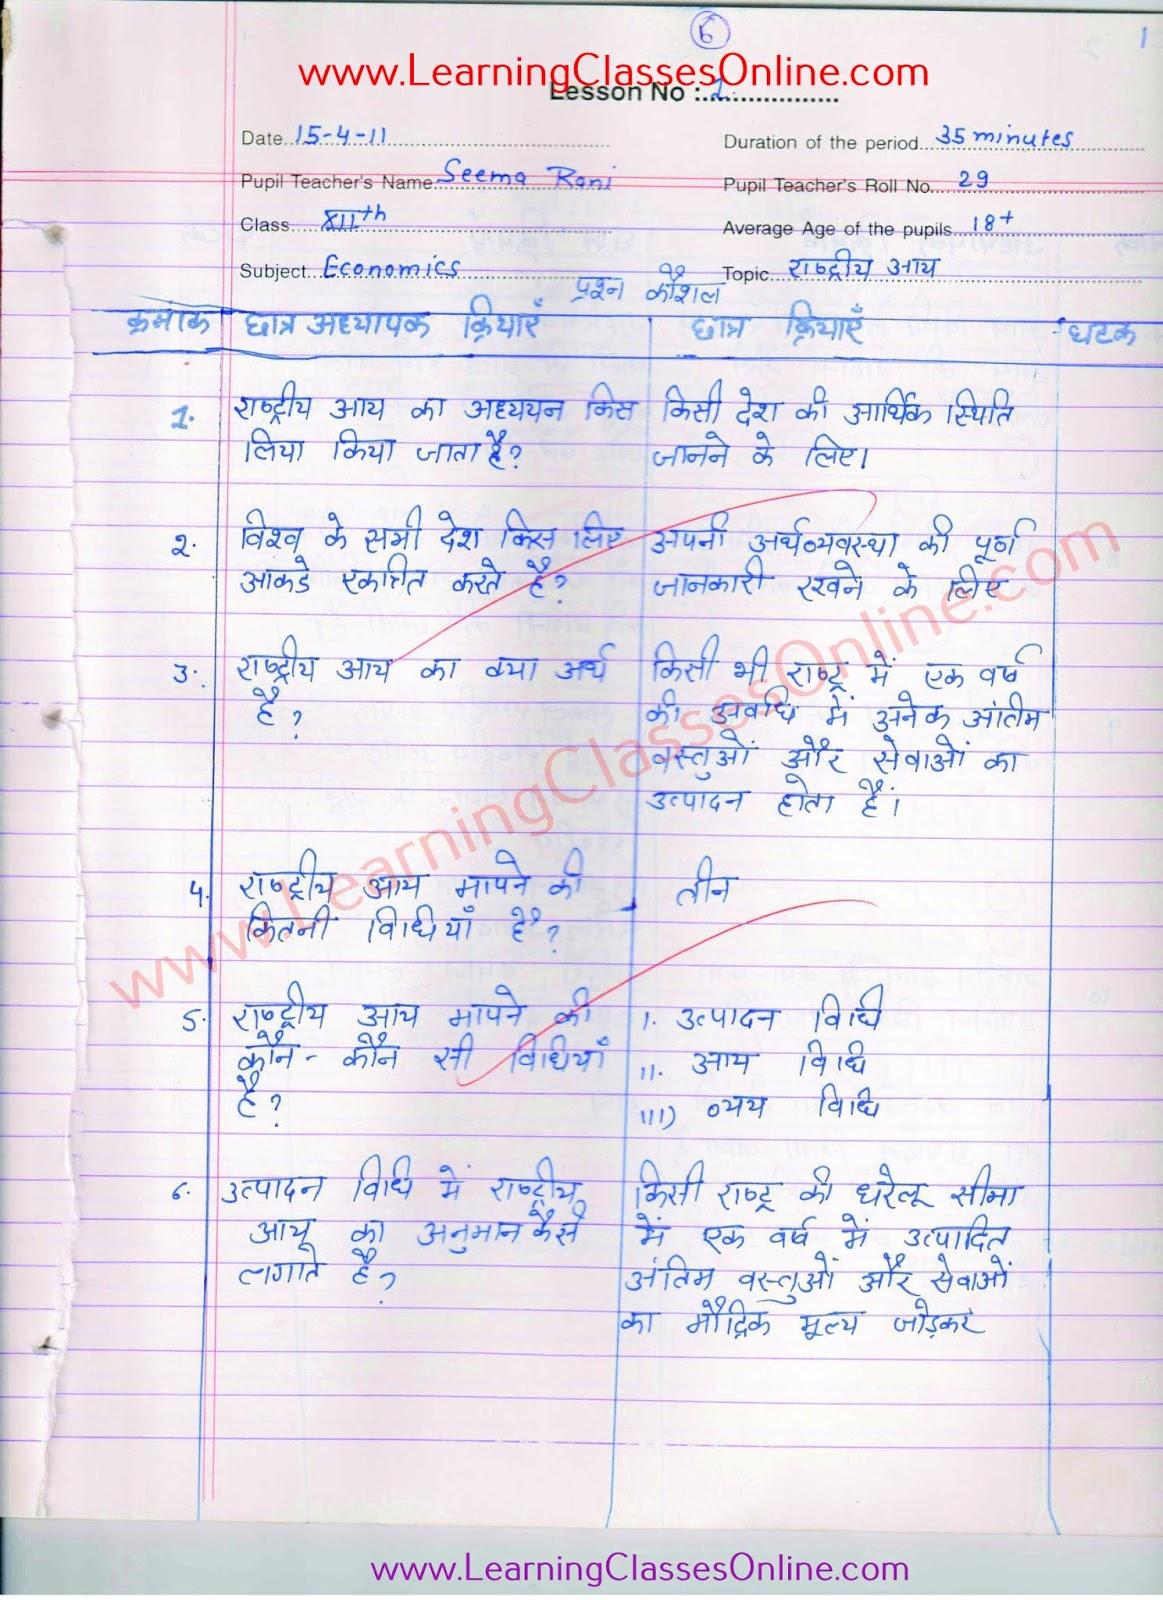 microteaching economics lesson plan, skill of questioning economics lesson plan in hindi